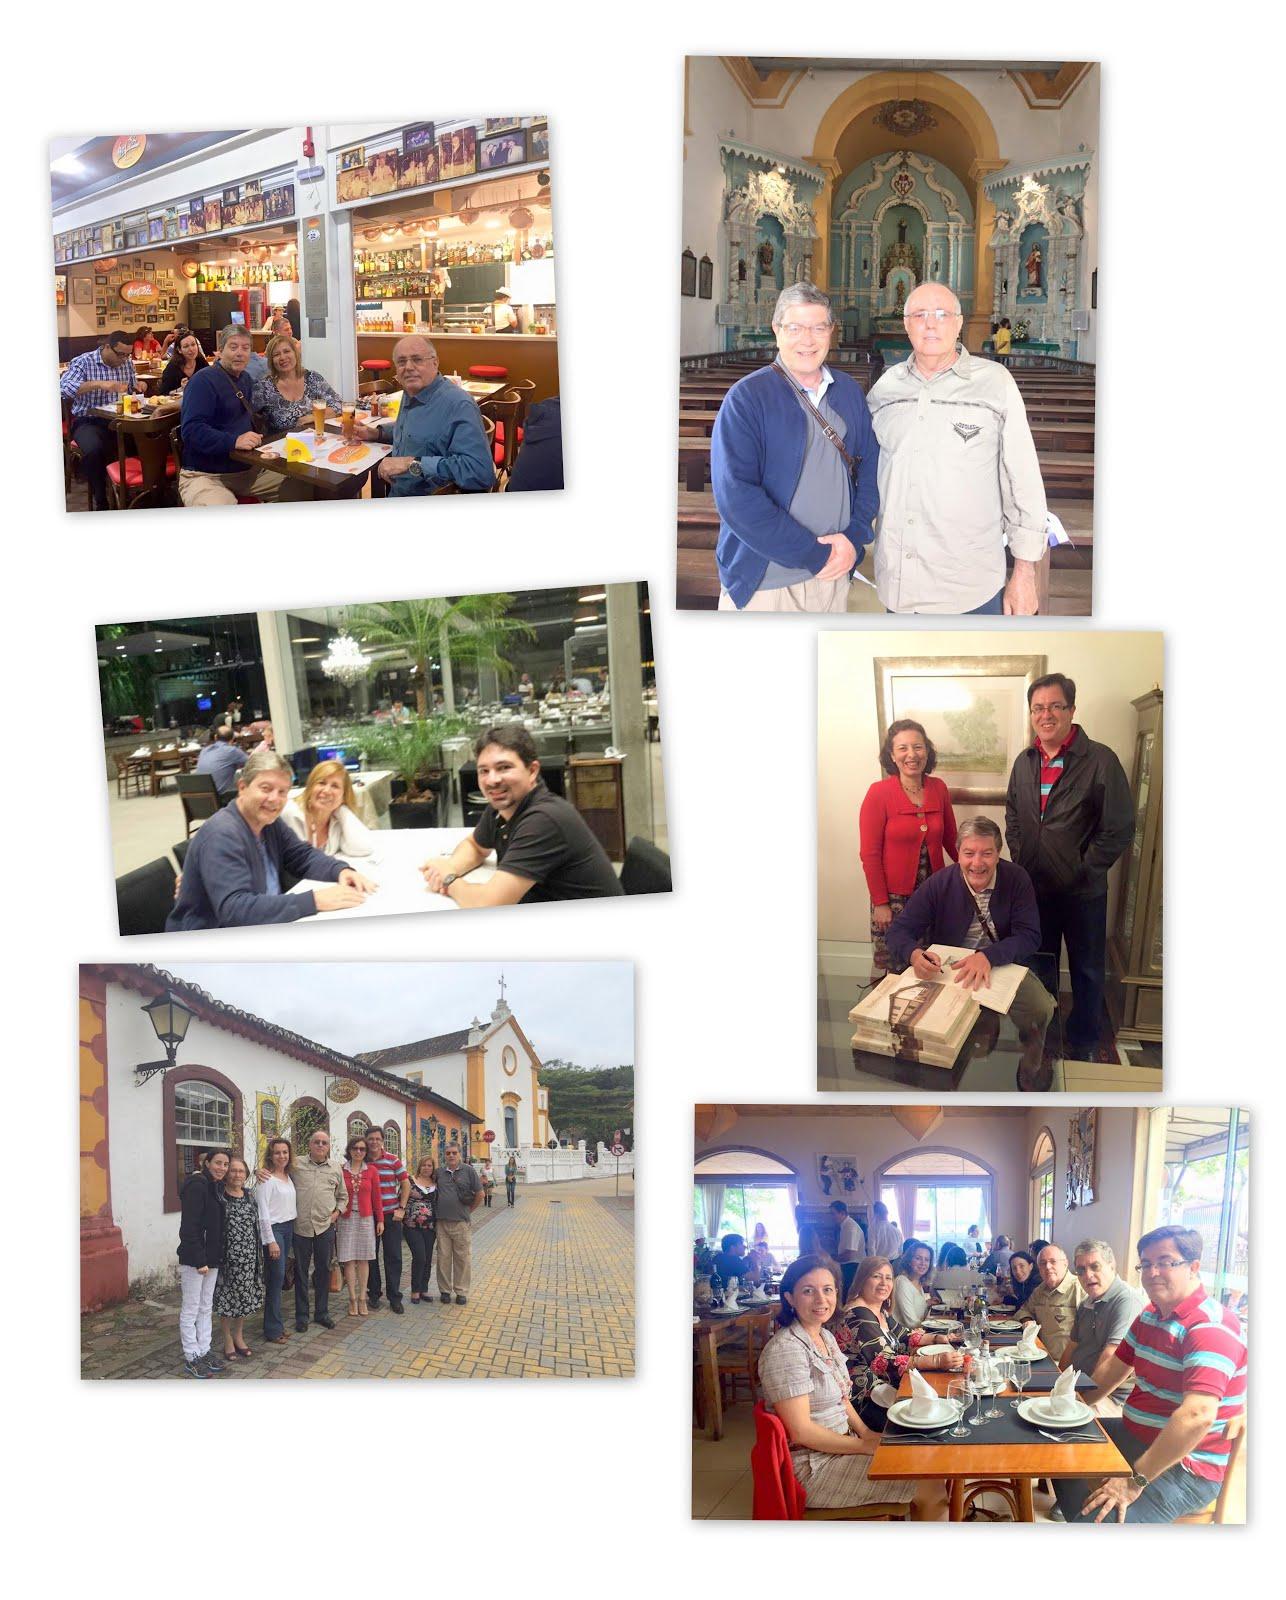 Encontro Família Barbosa Sandoval em Floripa 15/10/15